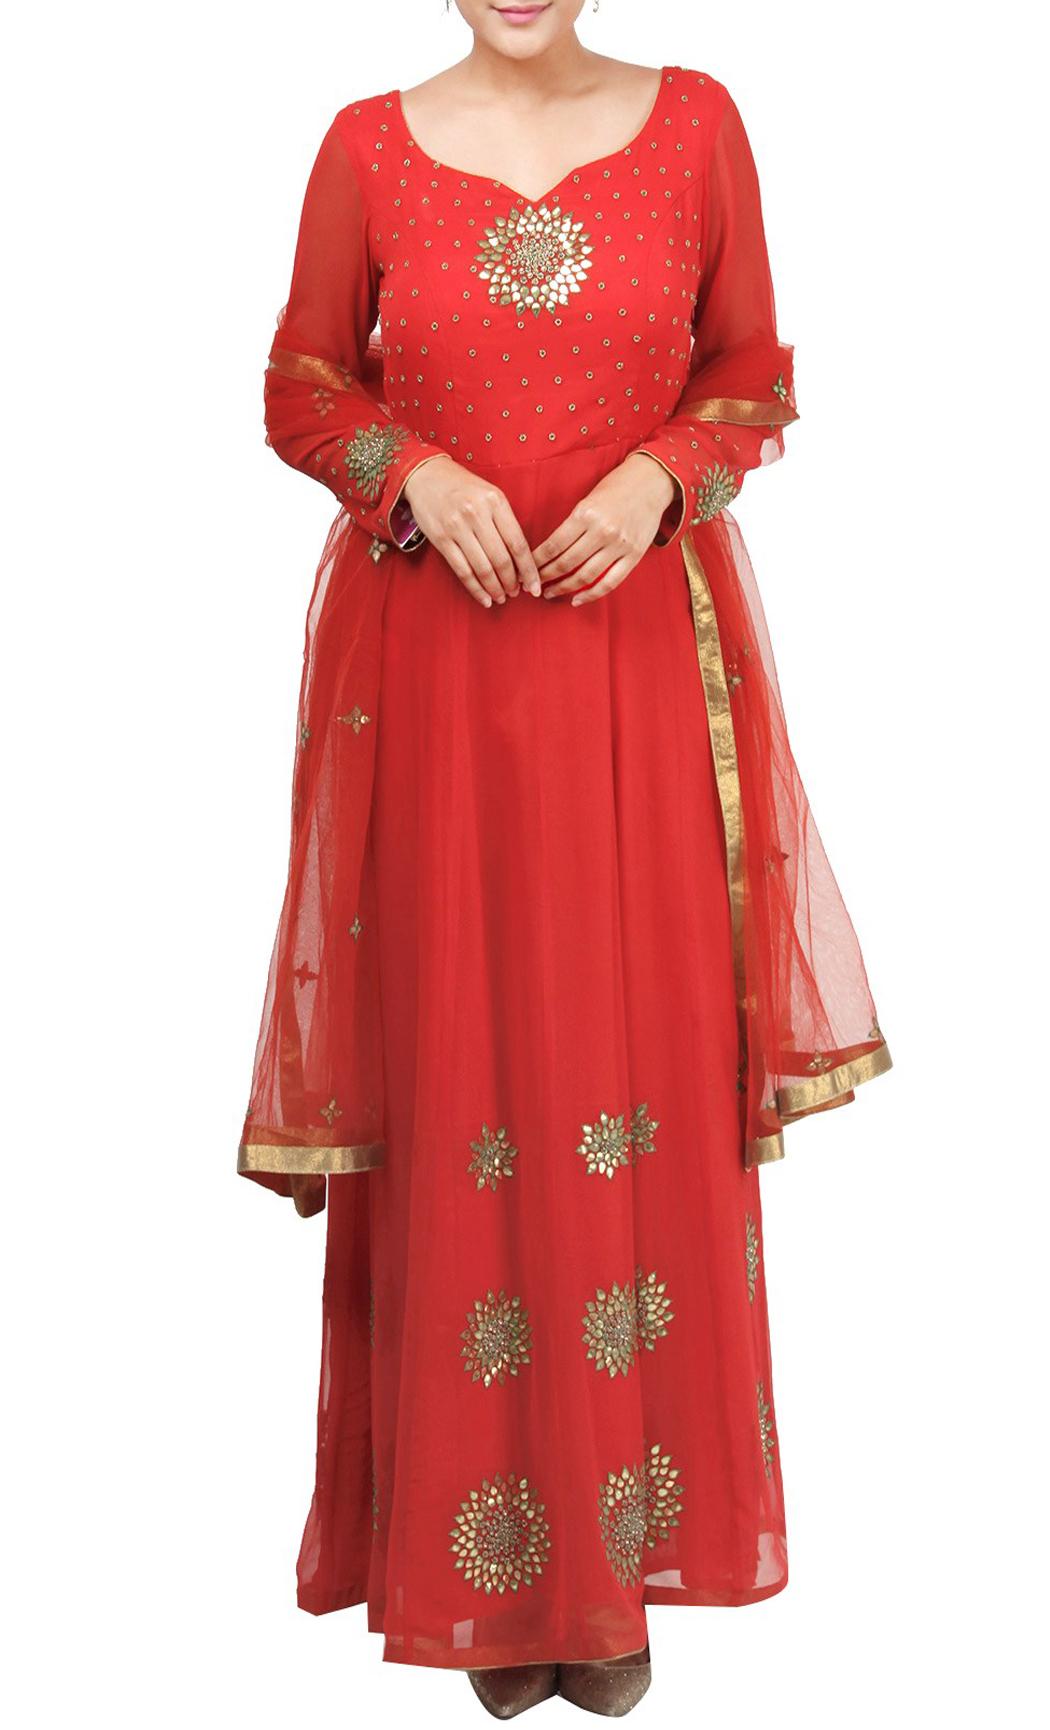 Red Embroidered Floor Length Kurta Set - Buy Online